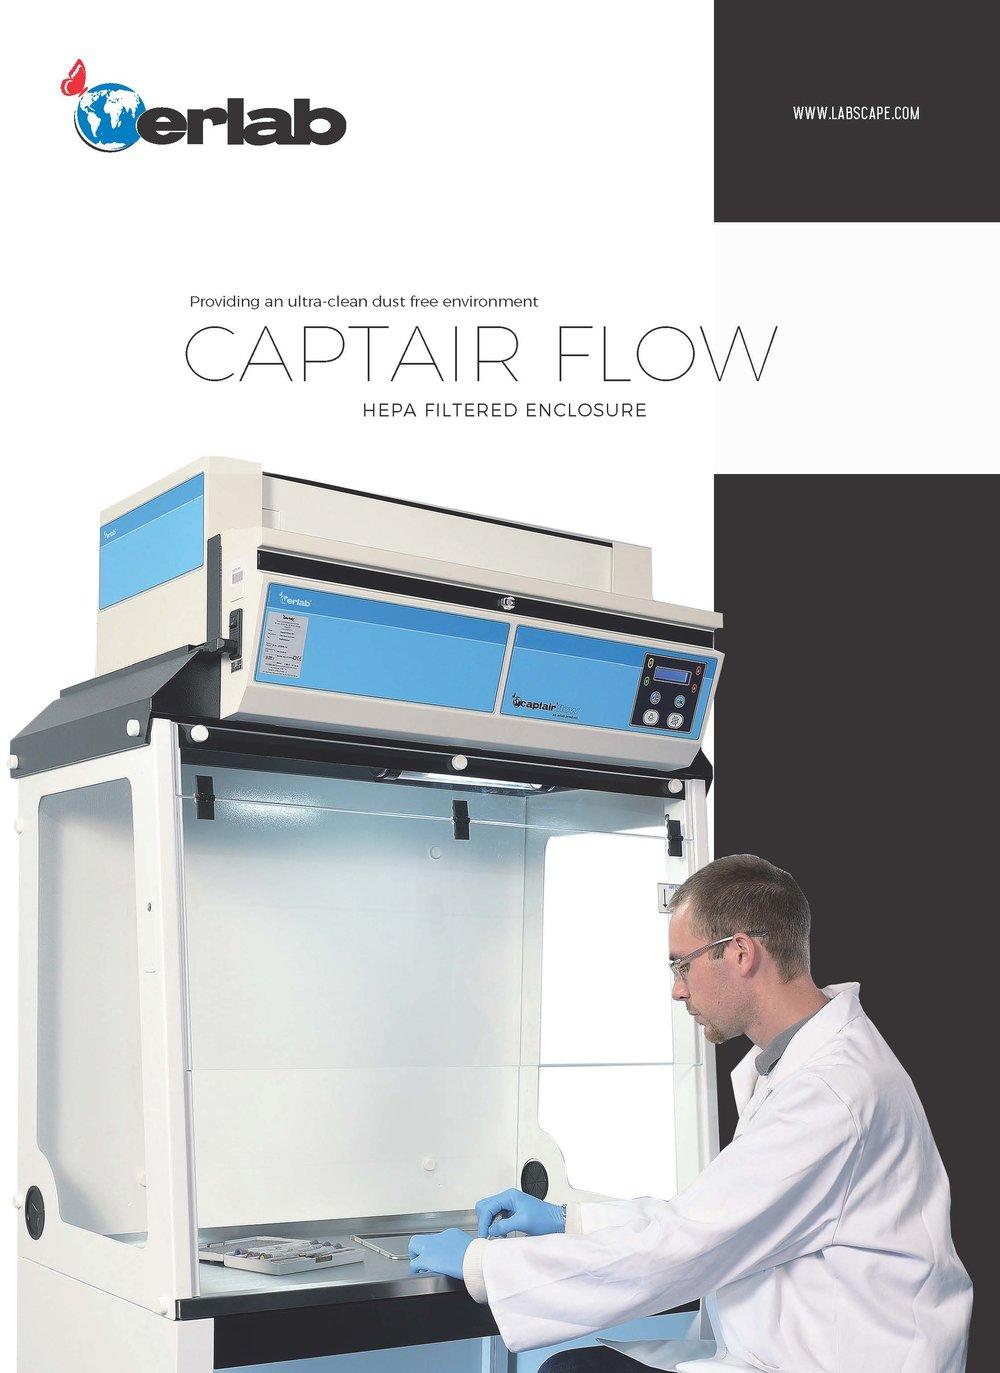 LS-Captair_Flow_Hepa Filtered Enclosures- COVER.jpg